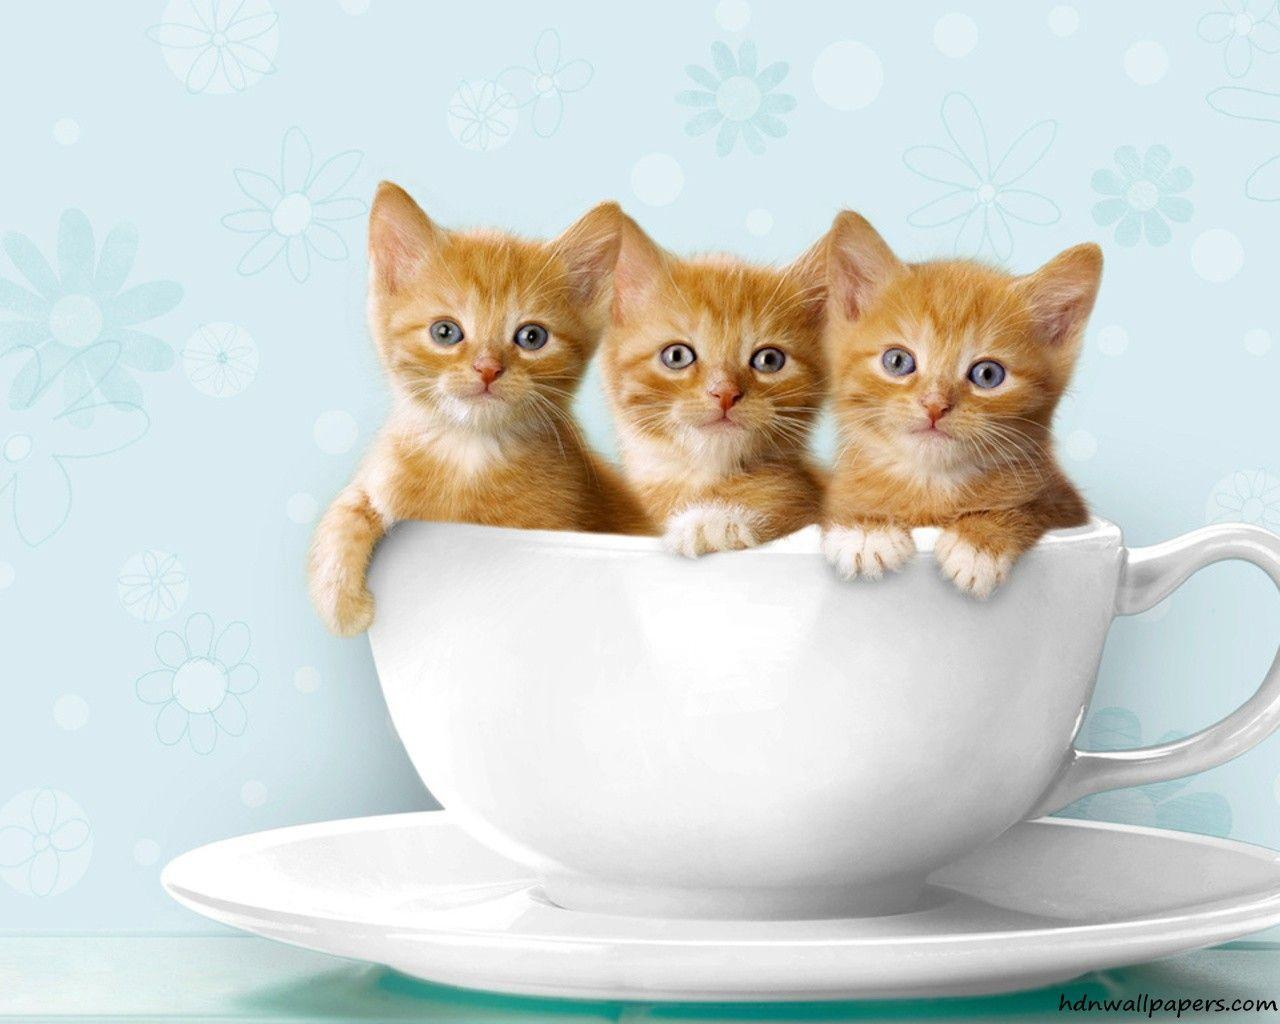 Free Kitten Wallpapers - Wallpaper Cave